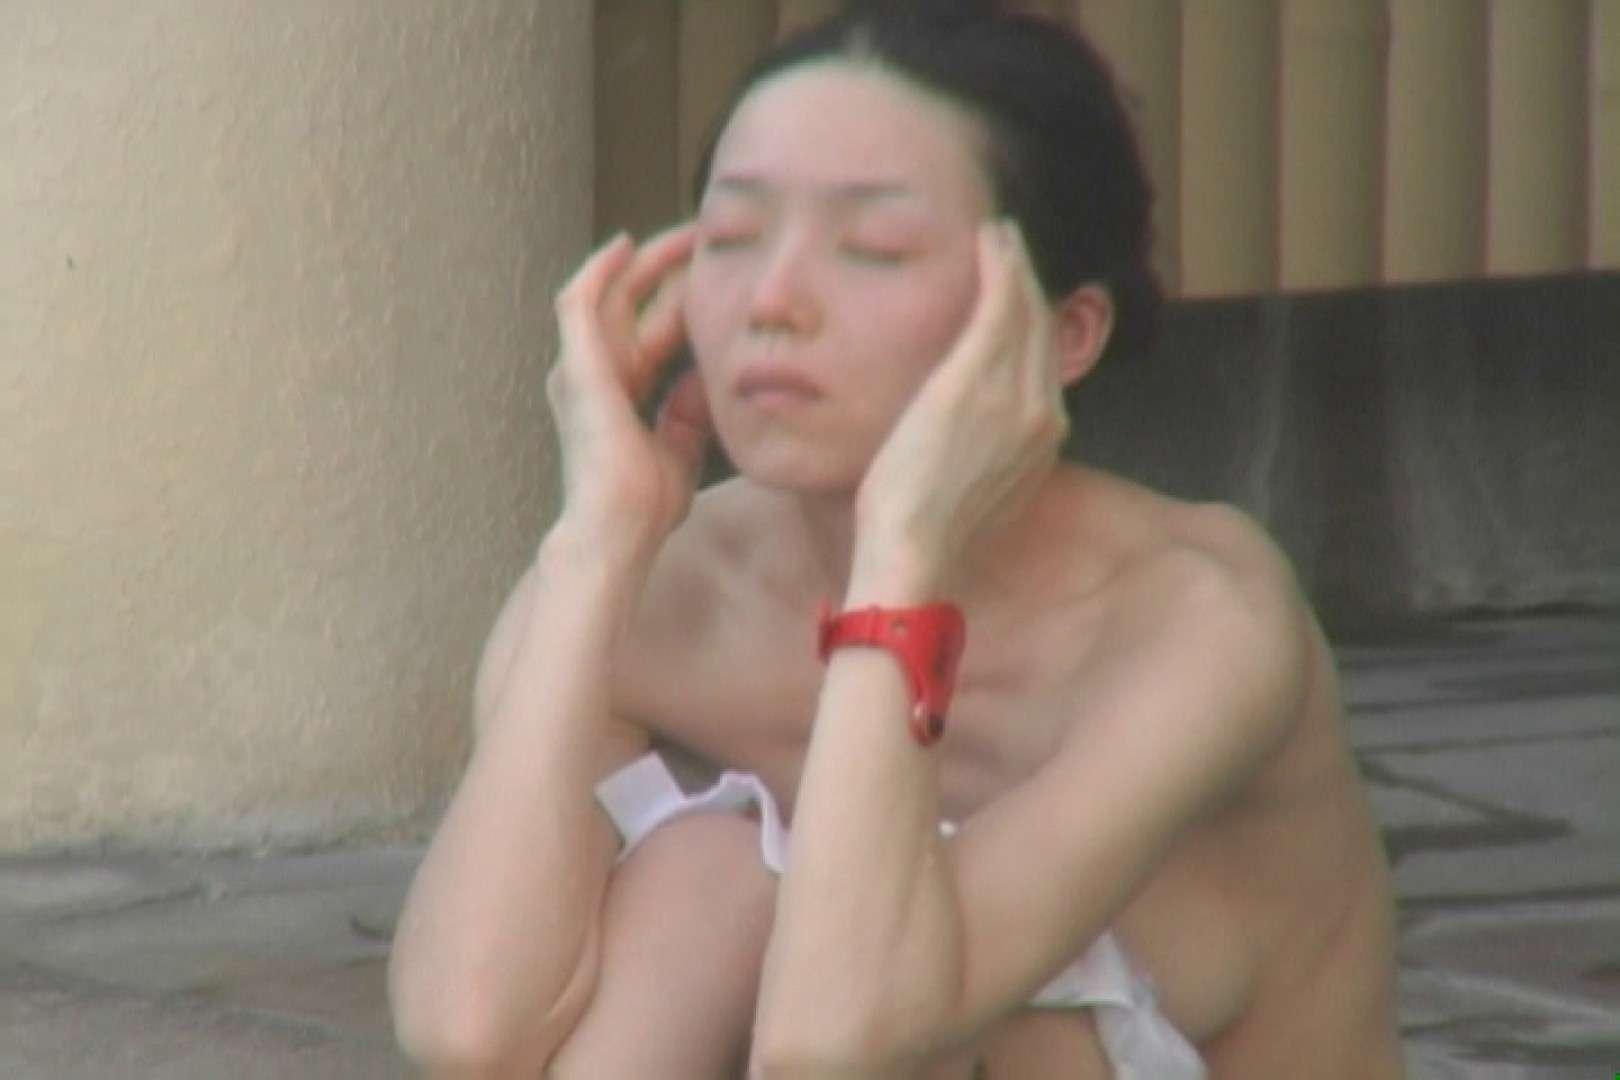 Aquaな露天風呂Vol.577 0  51連発 22